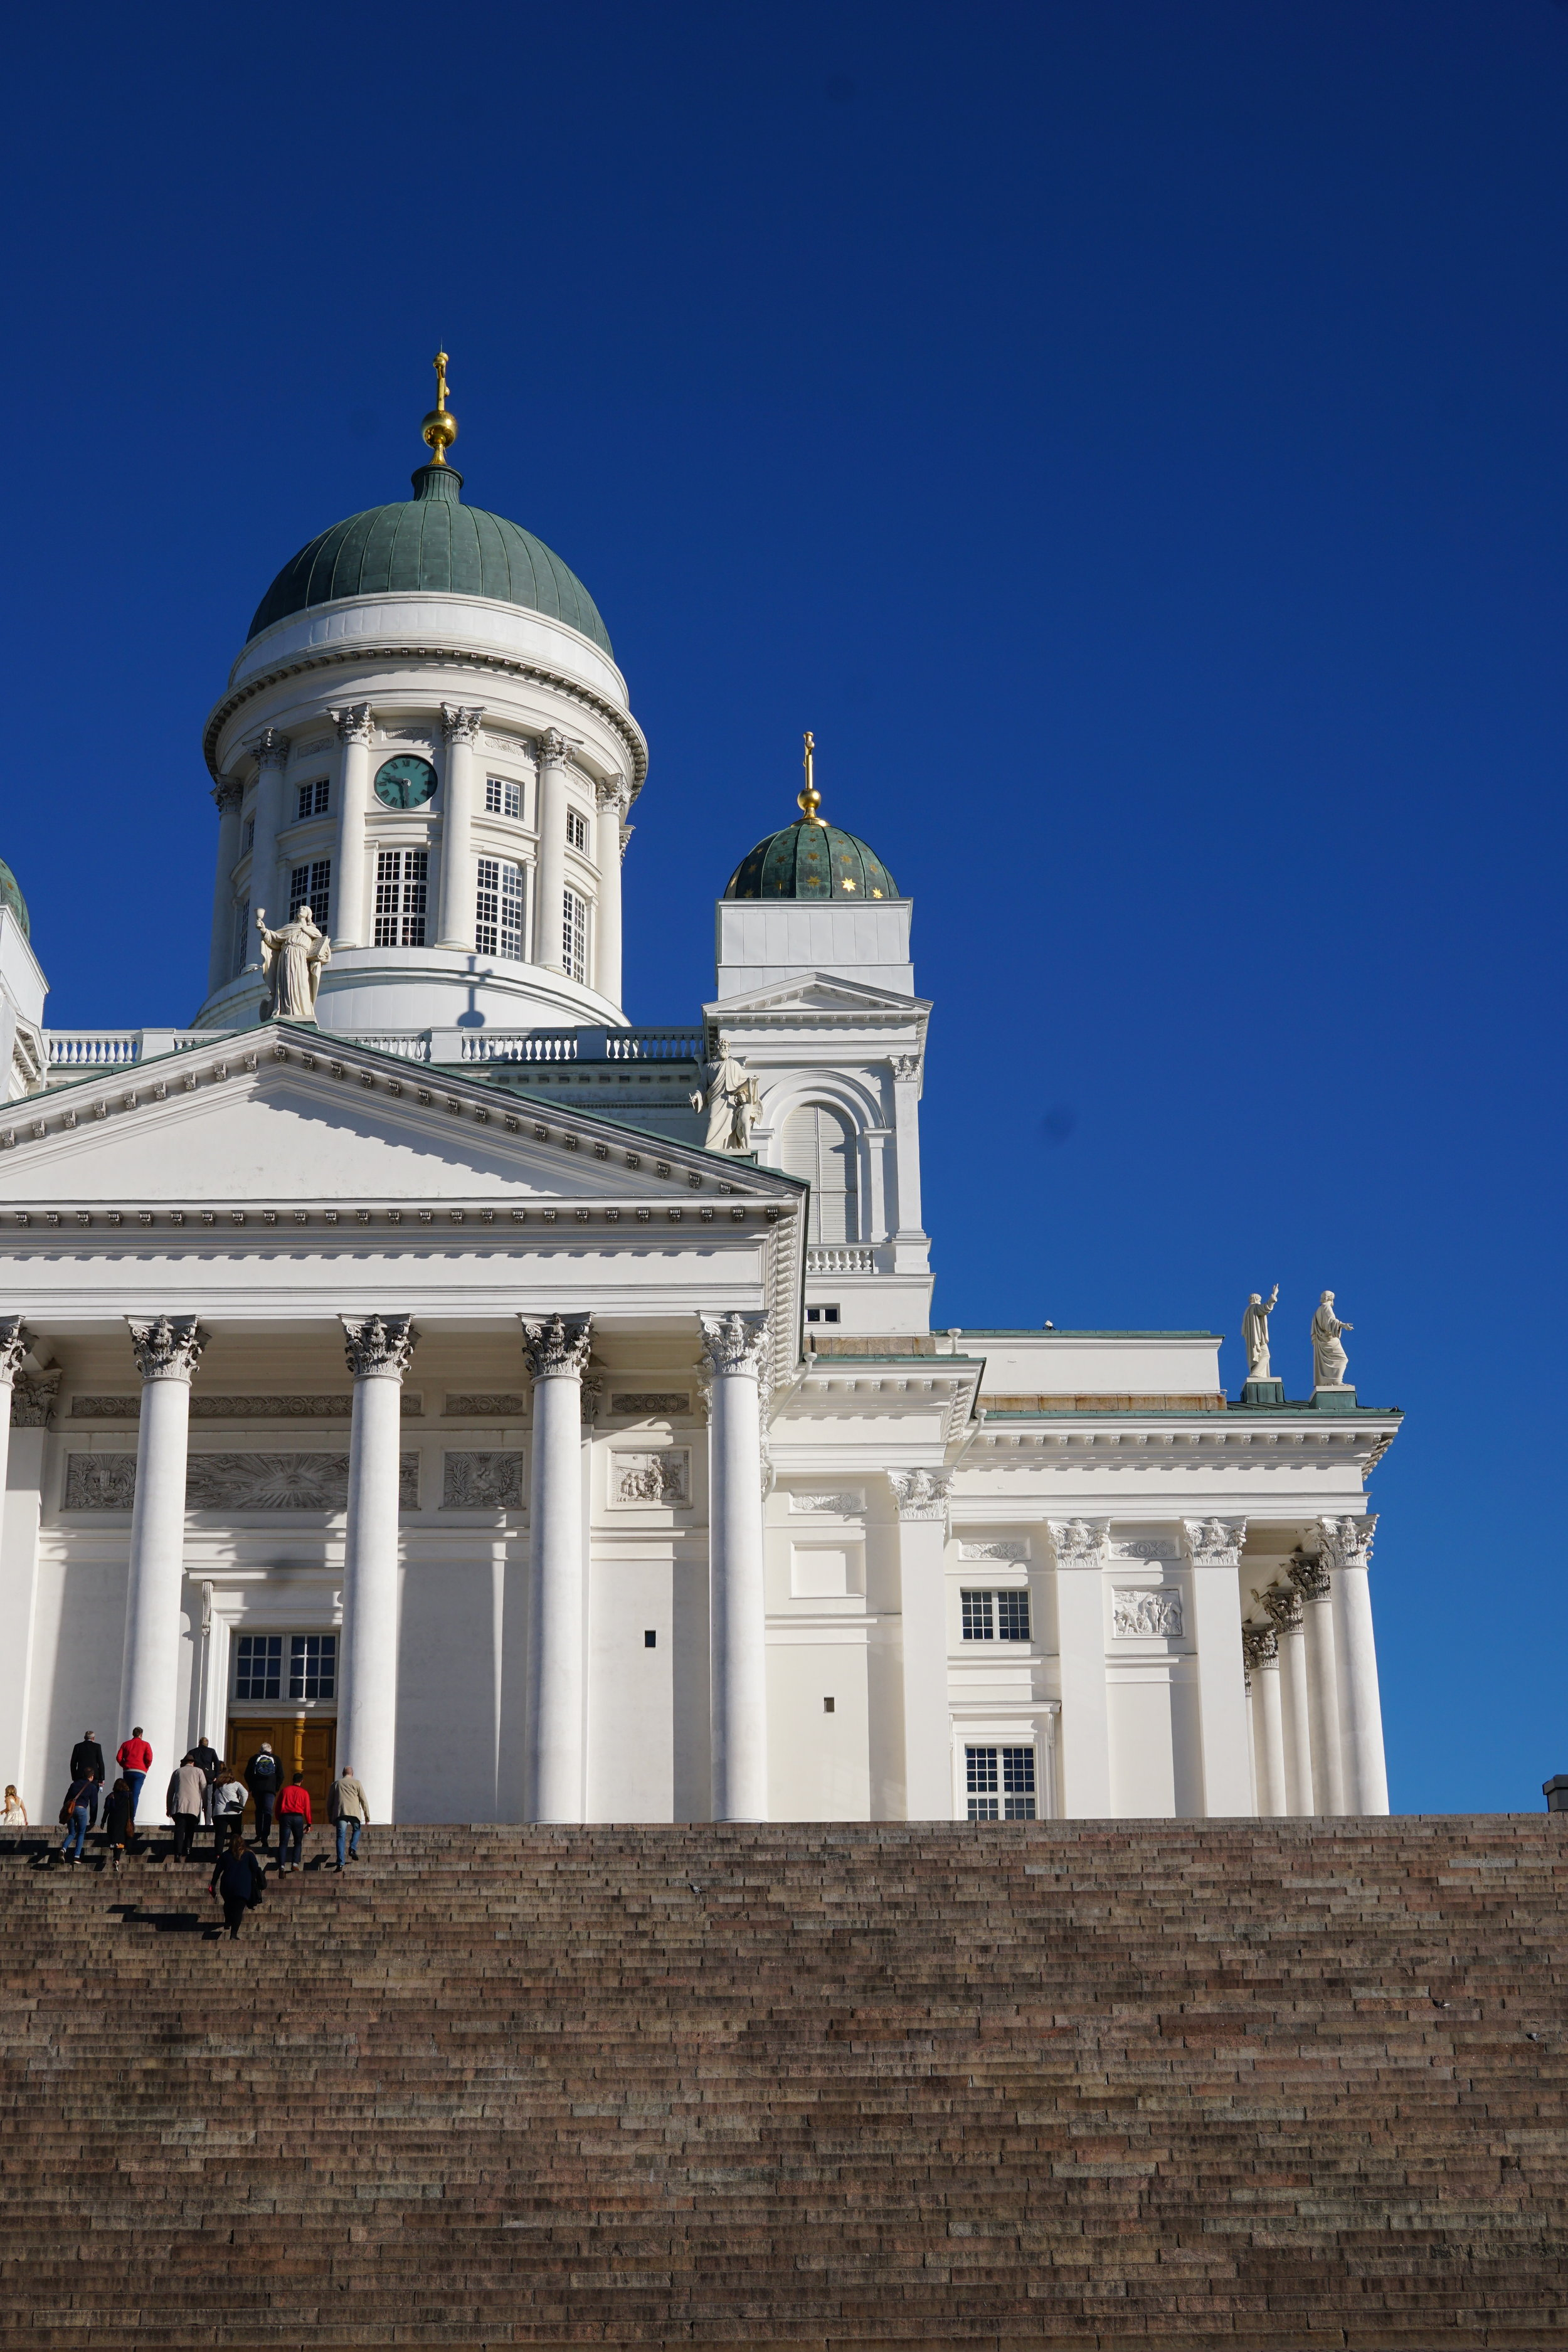 Lutheran Cathedral at Senate Square